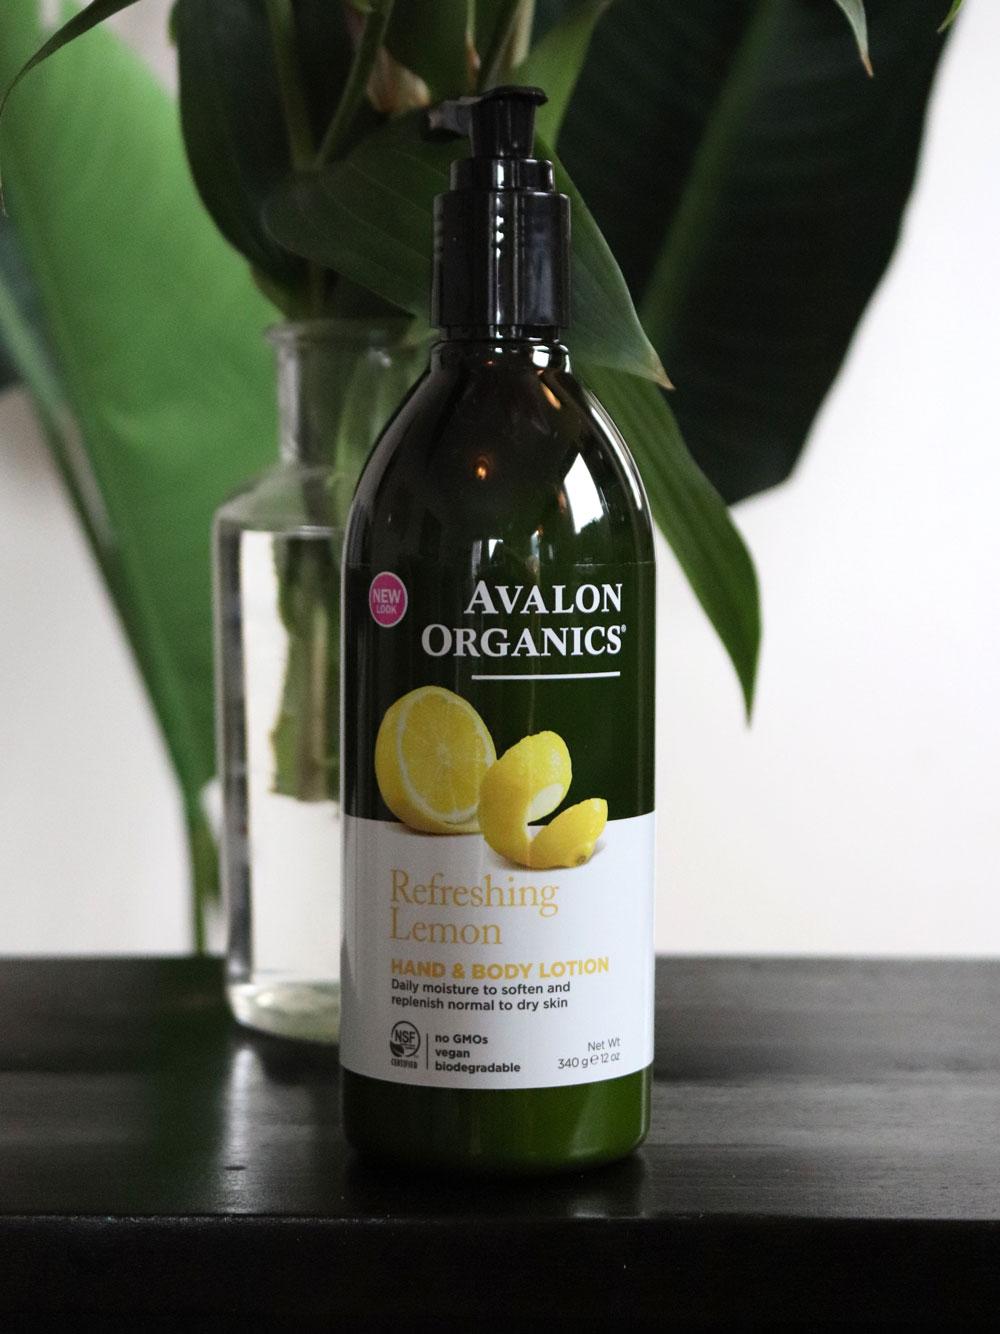 Avalon Organics hand and body lotion at iHerb